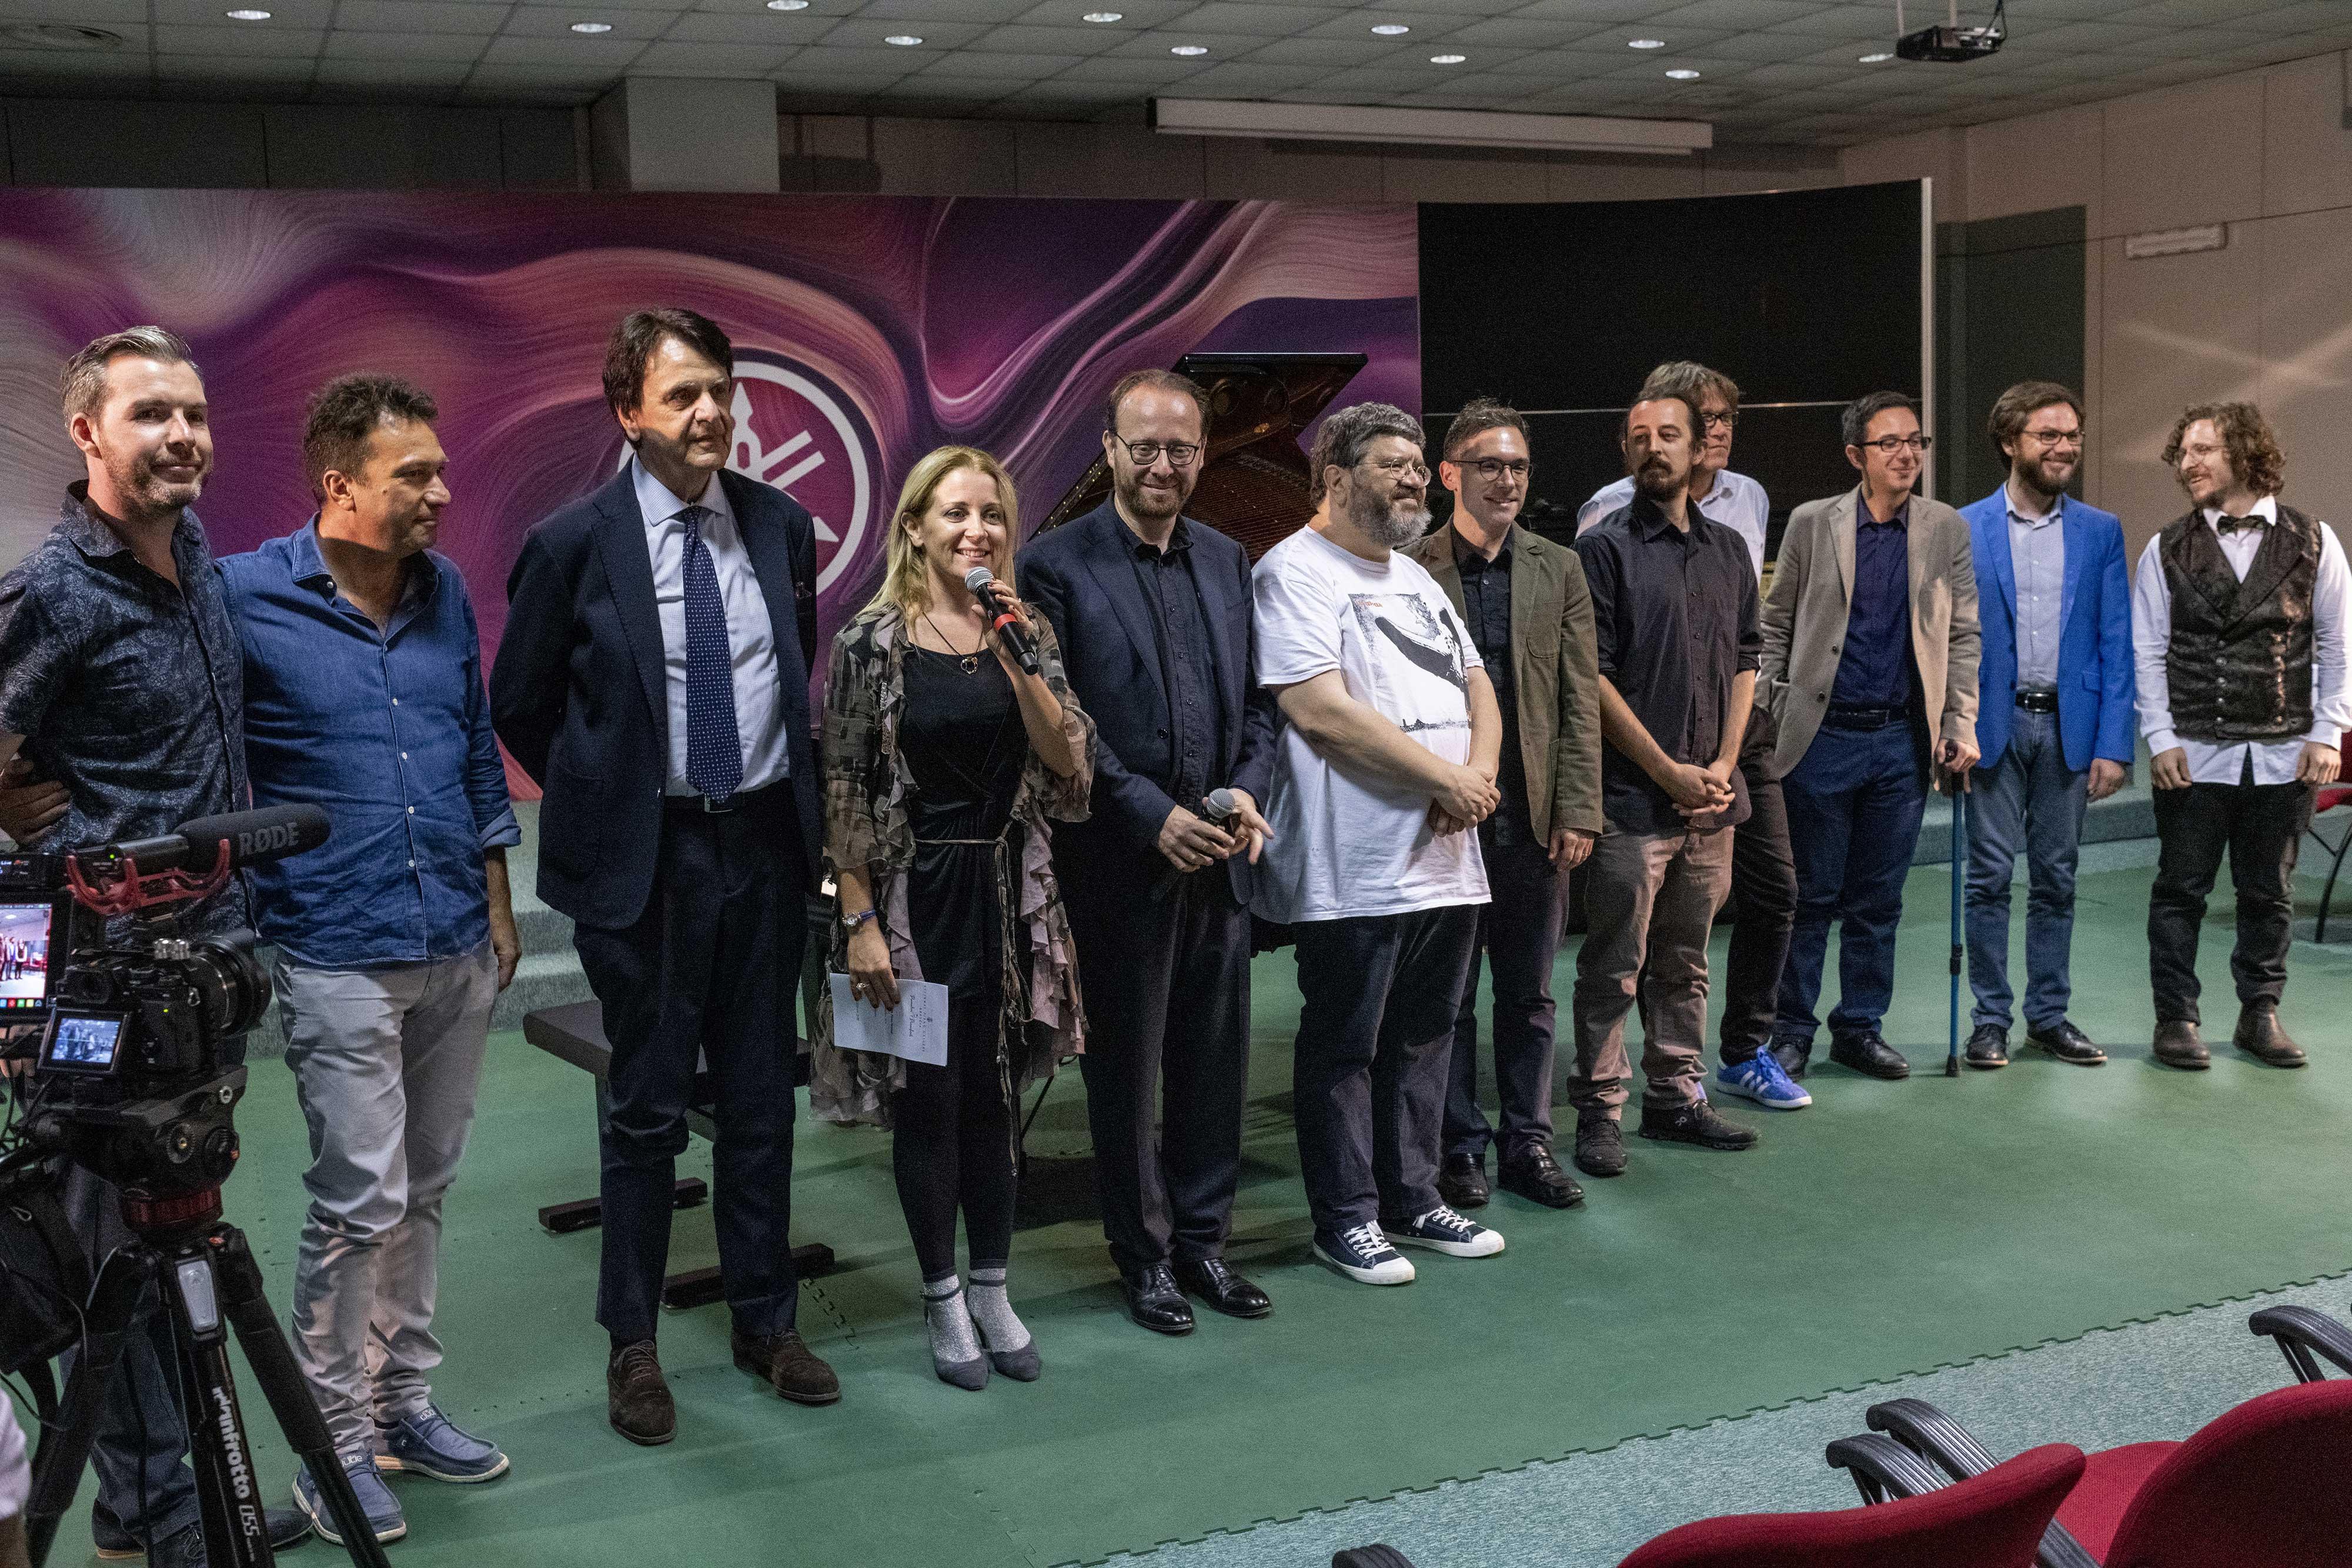 Finale Disklavier Composers Contest